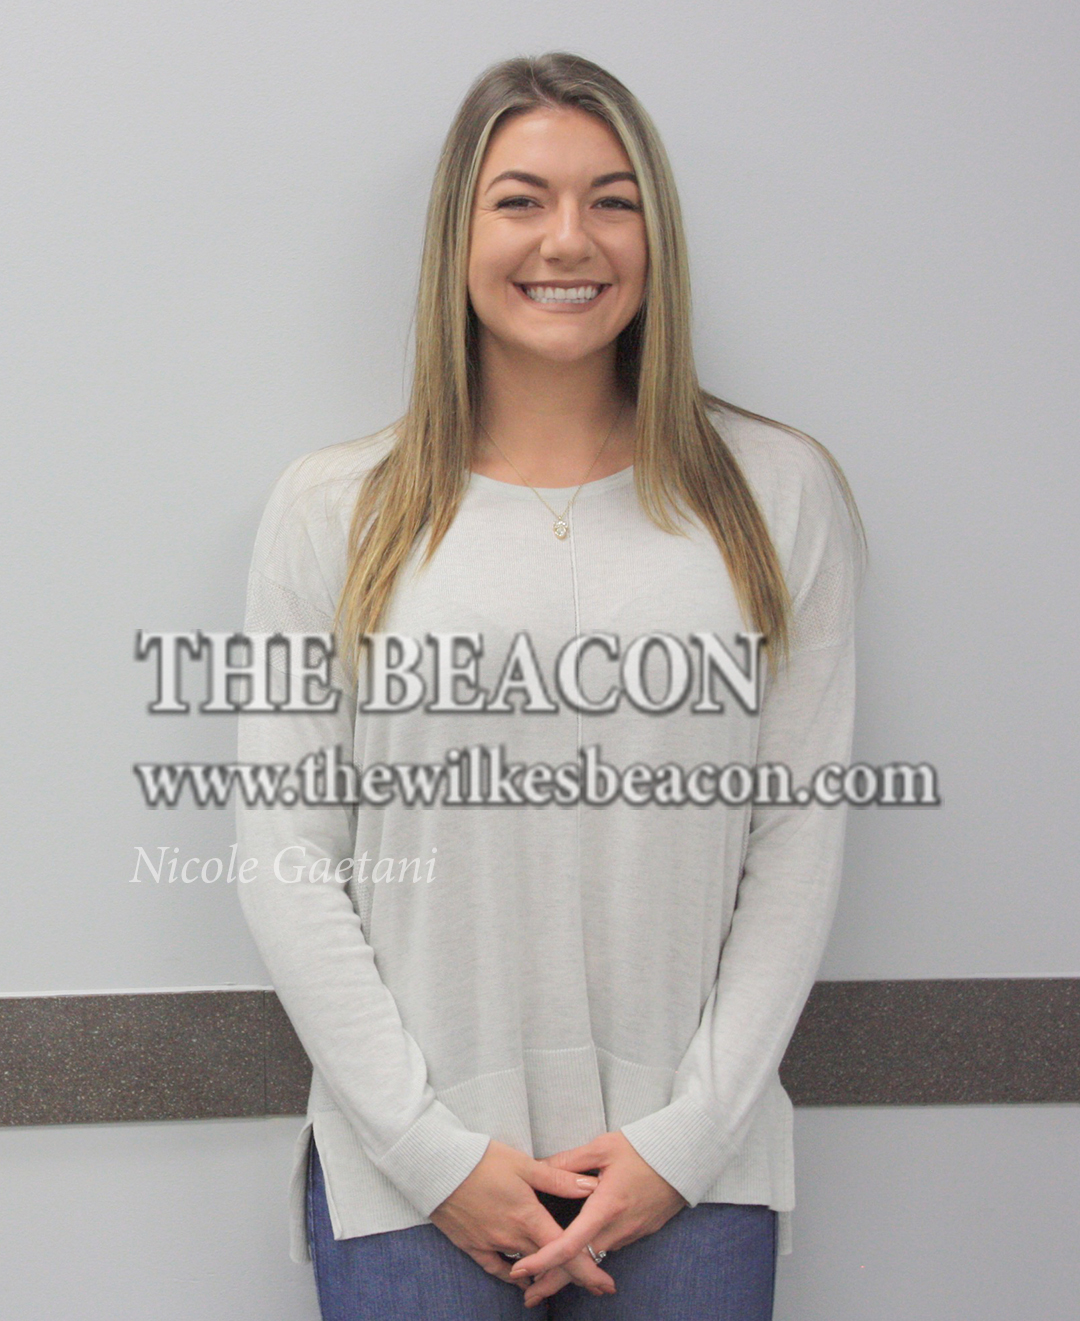 Female Athlete of the Week: Jordan Vasarkovy, senior tennis player